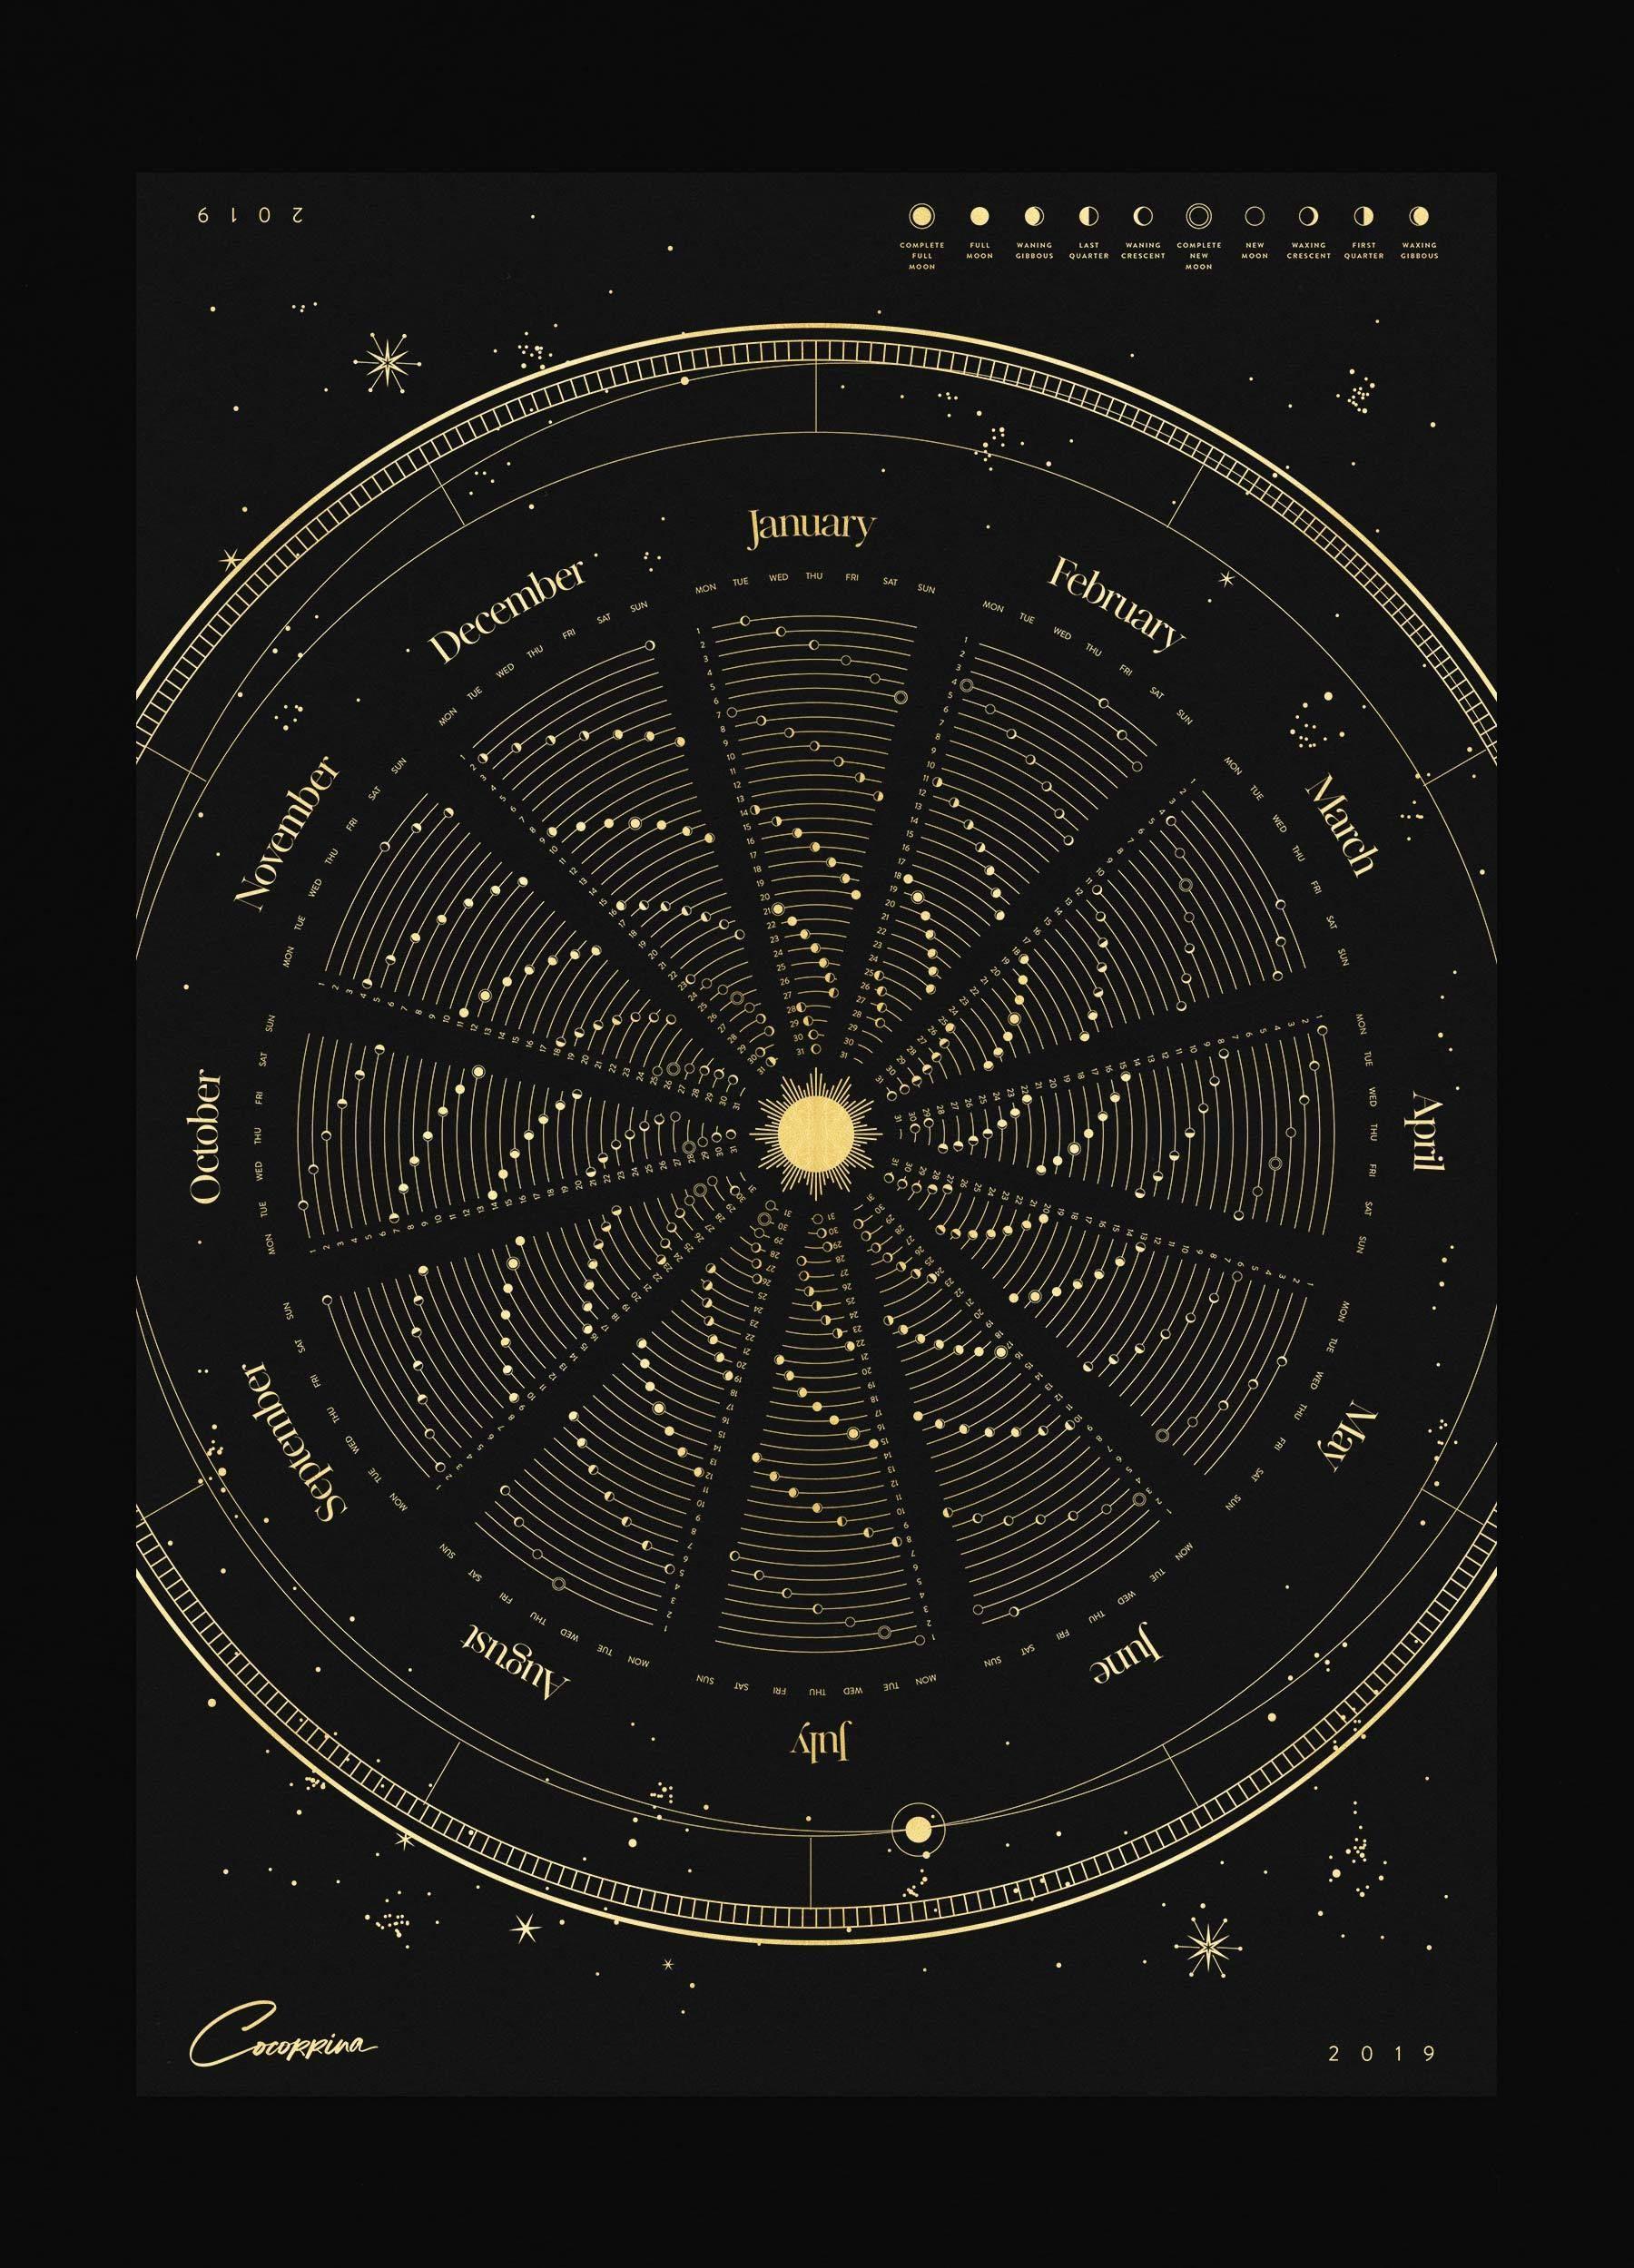 astronomy magazine calendar - HD1080×1350